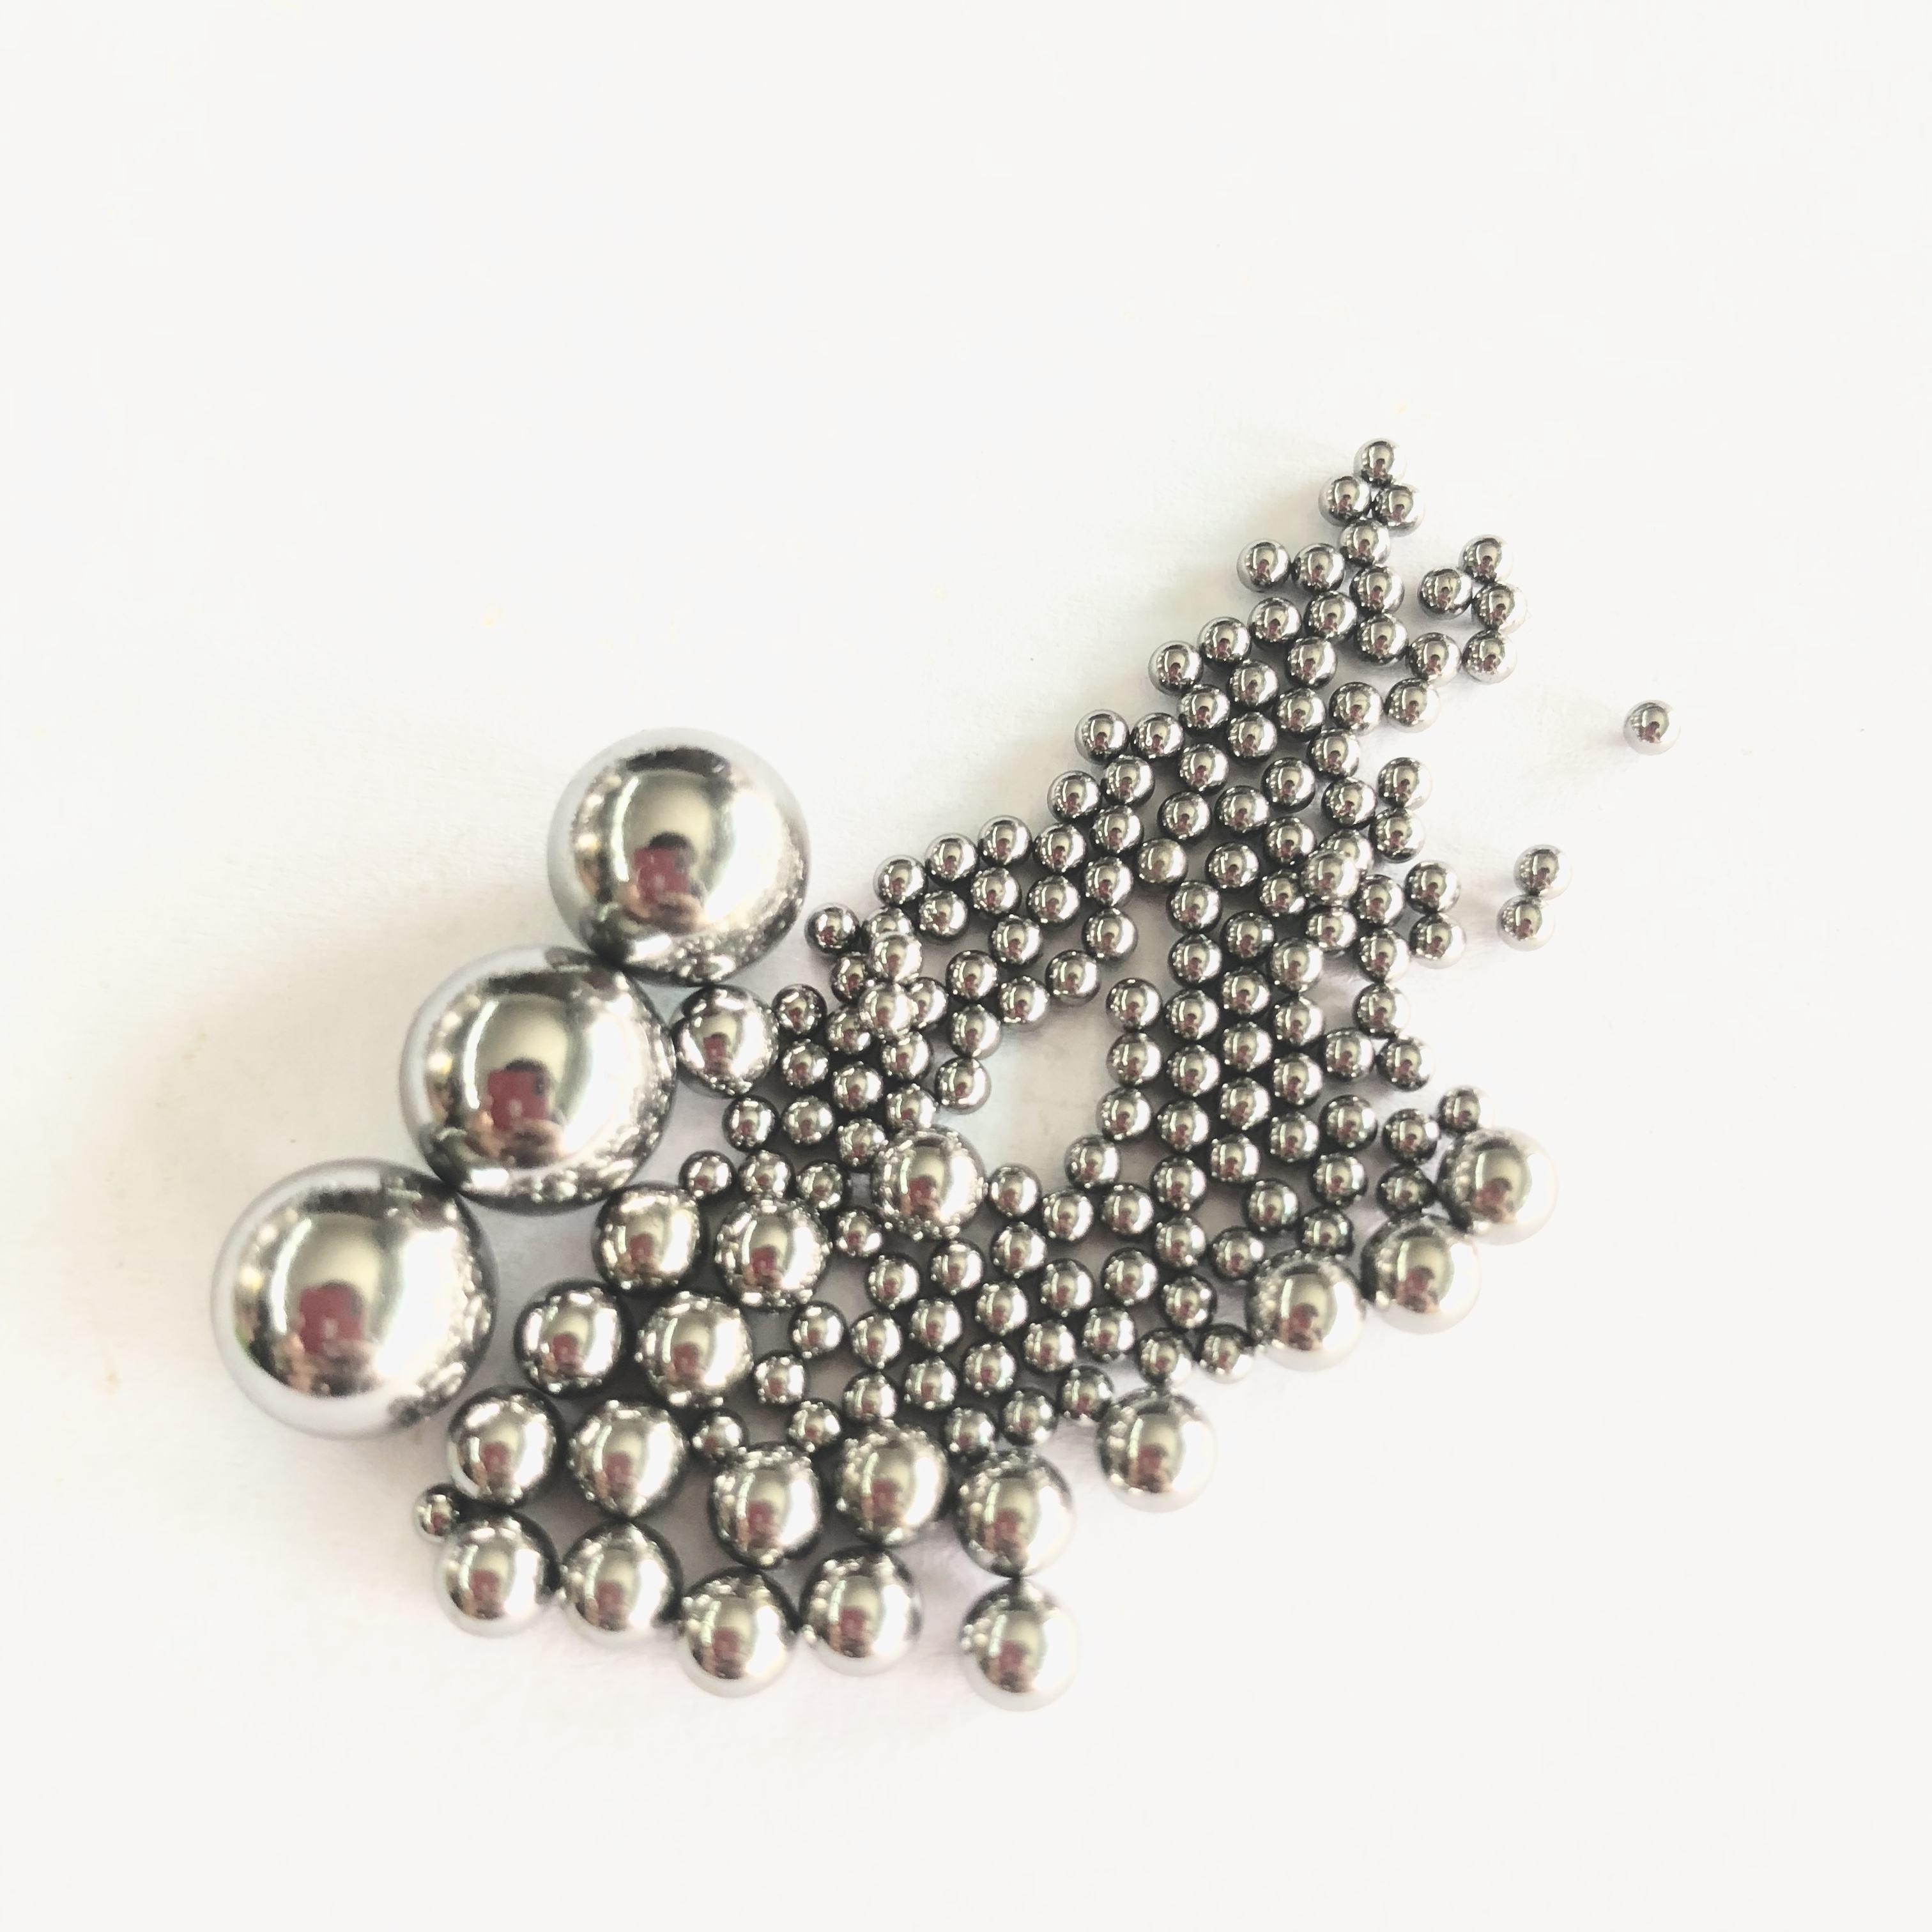 "100 3//8/"" Inch G25 Precision Chromium Chrome Steel Bearing Balls AISI 52100"